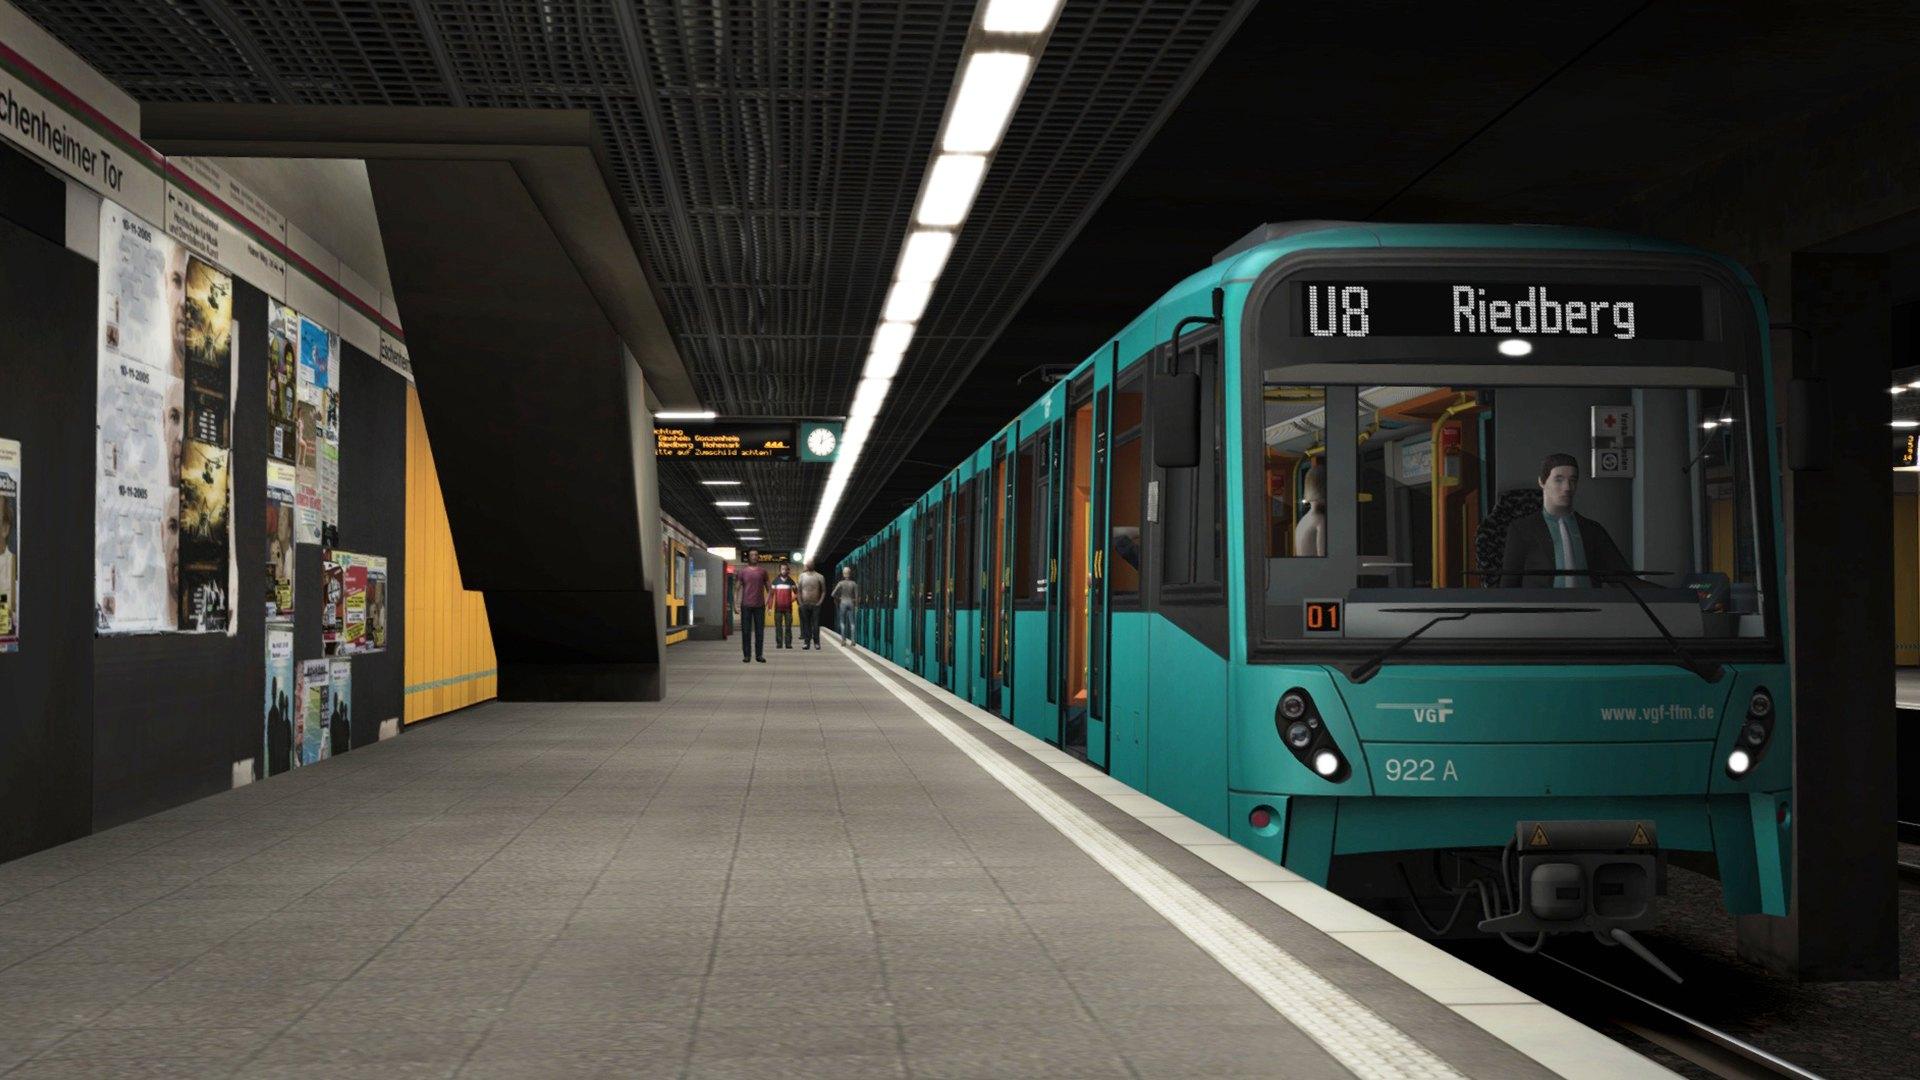 U Bahn Frankfurt Simulator